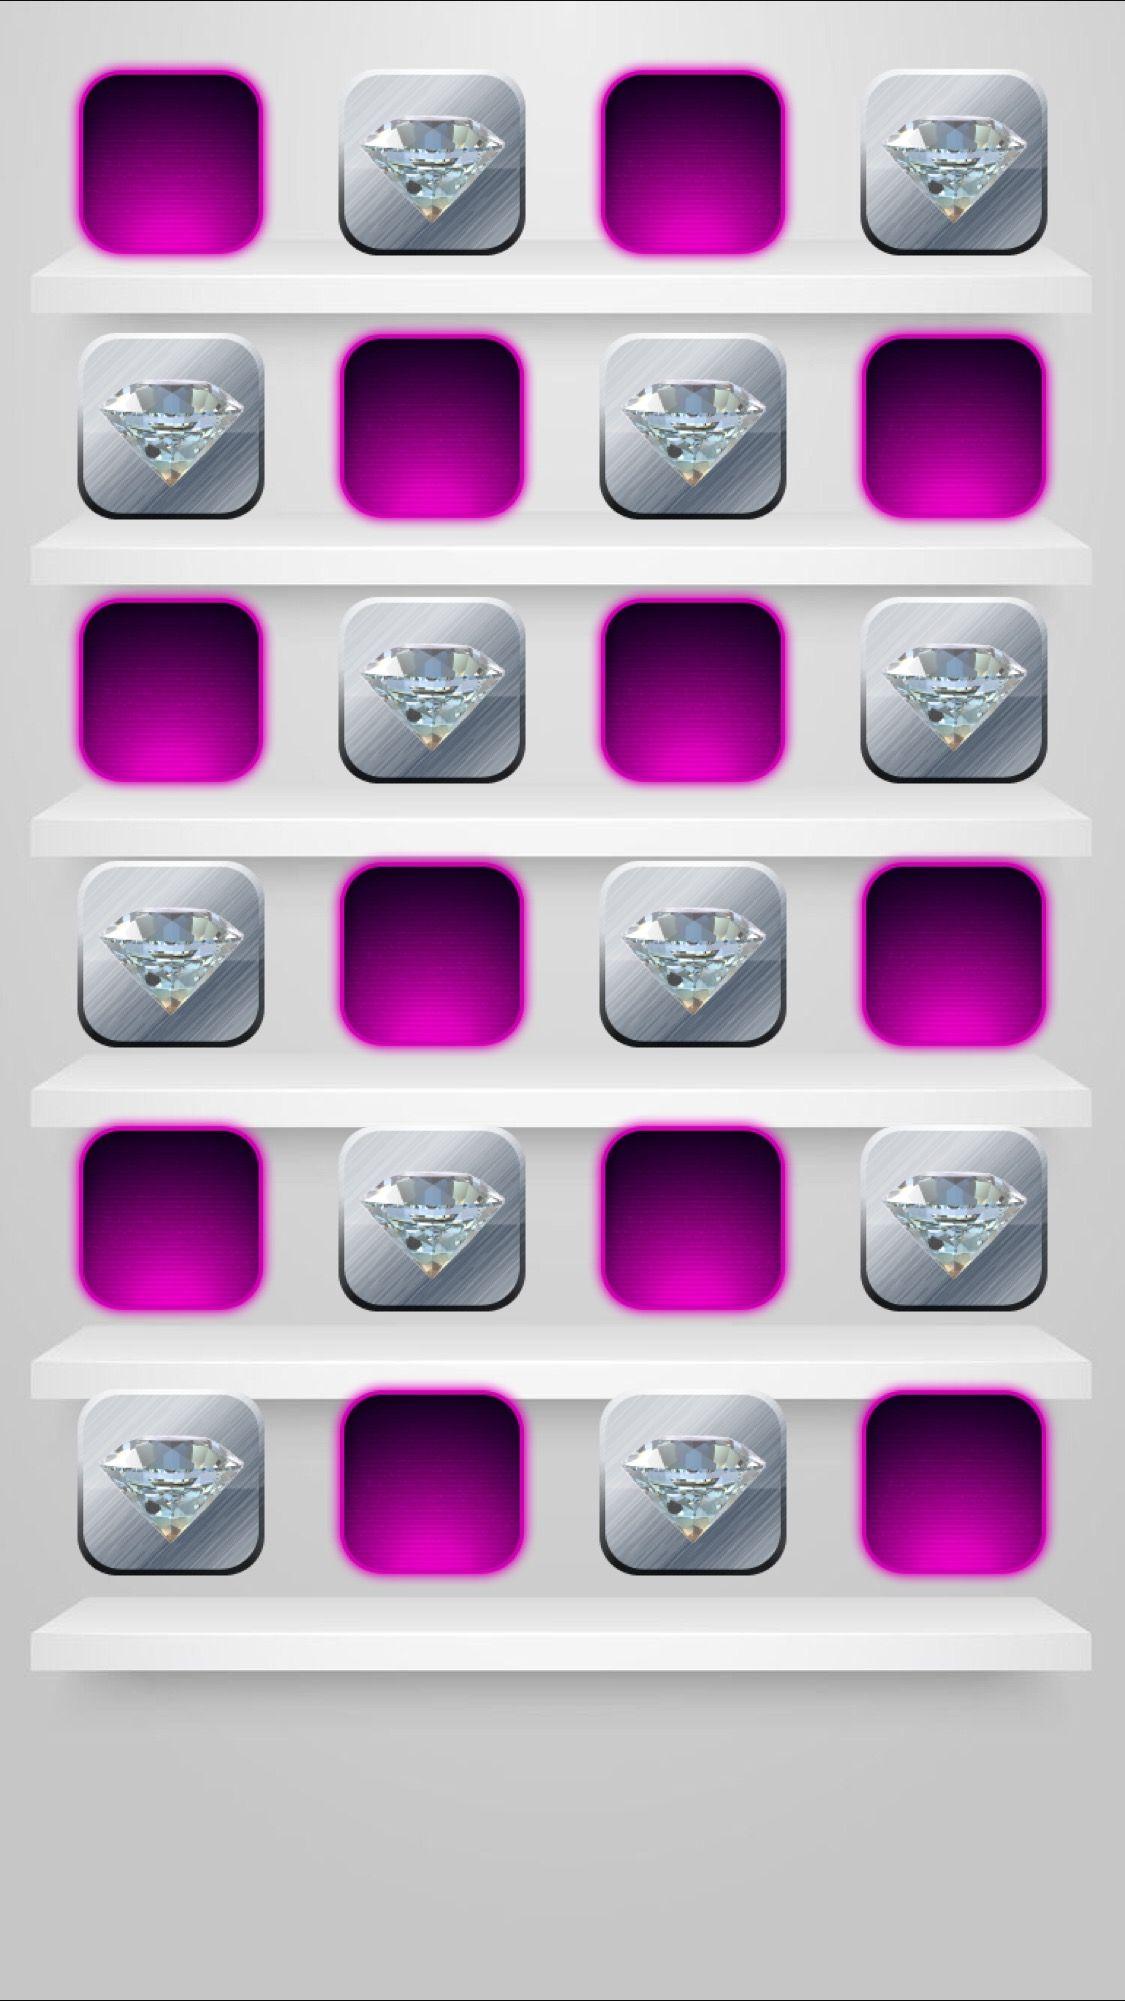 Popular Wallpaper Hello Kitty Iphone 6s Plus - 1370529e33f4b4ae2f0d1d639b45e8b7  Best Photo Reference_395745.jpg